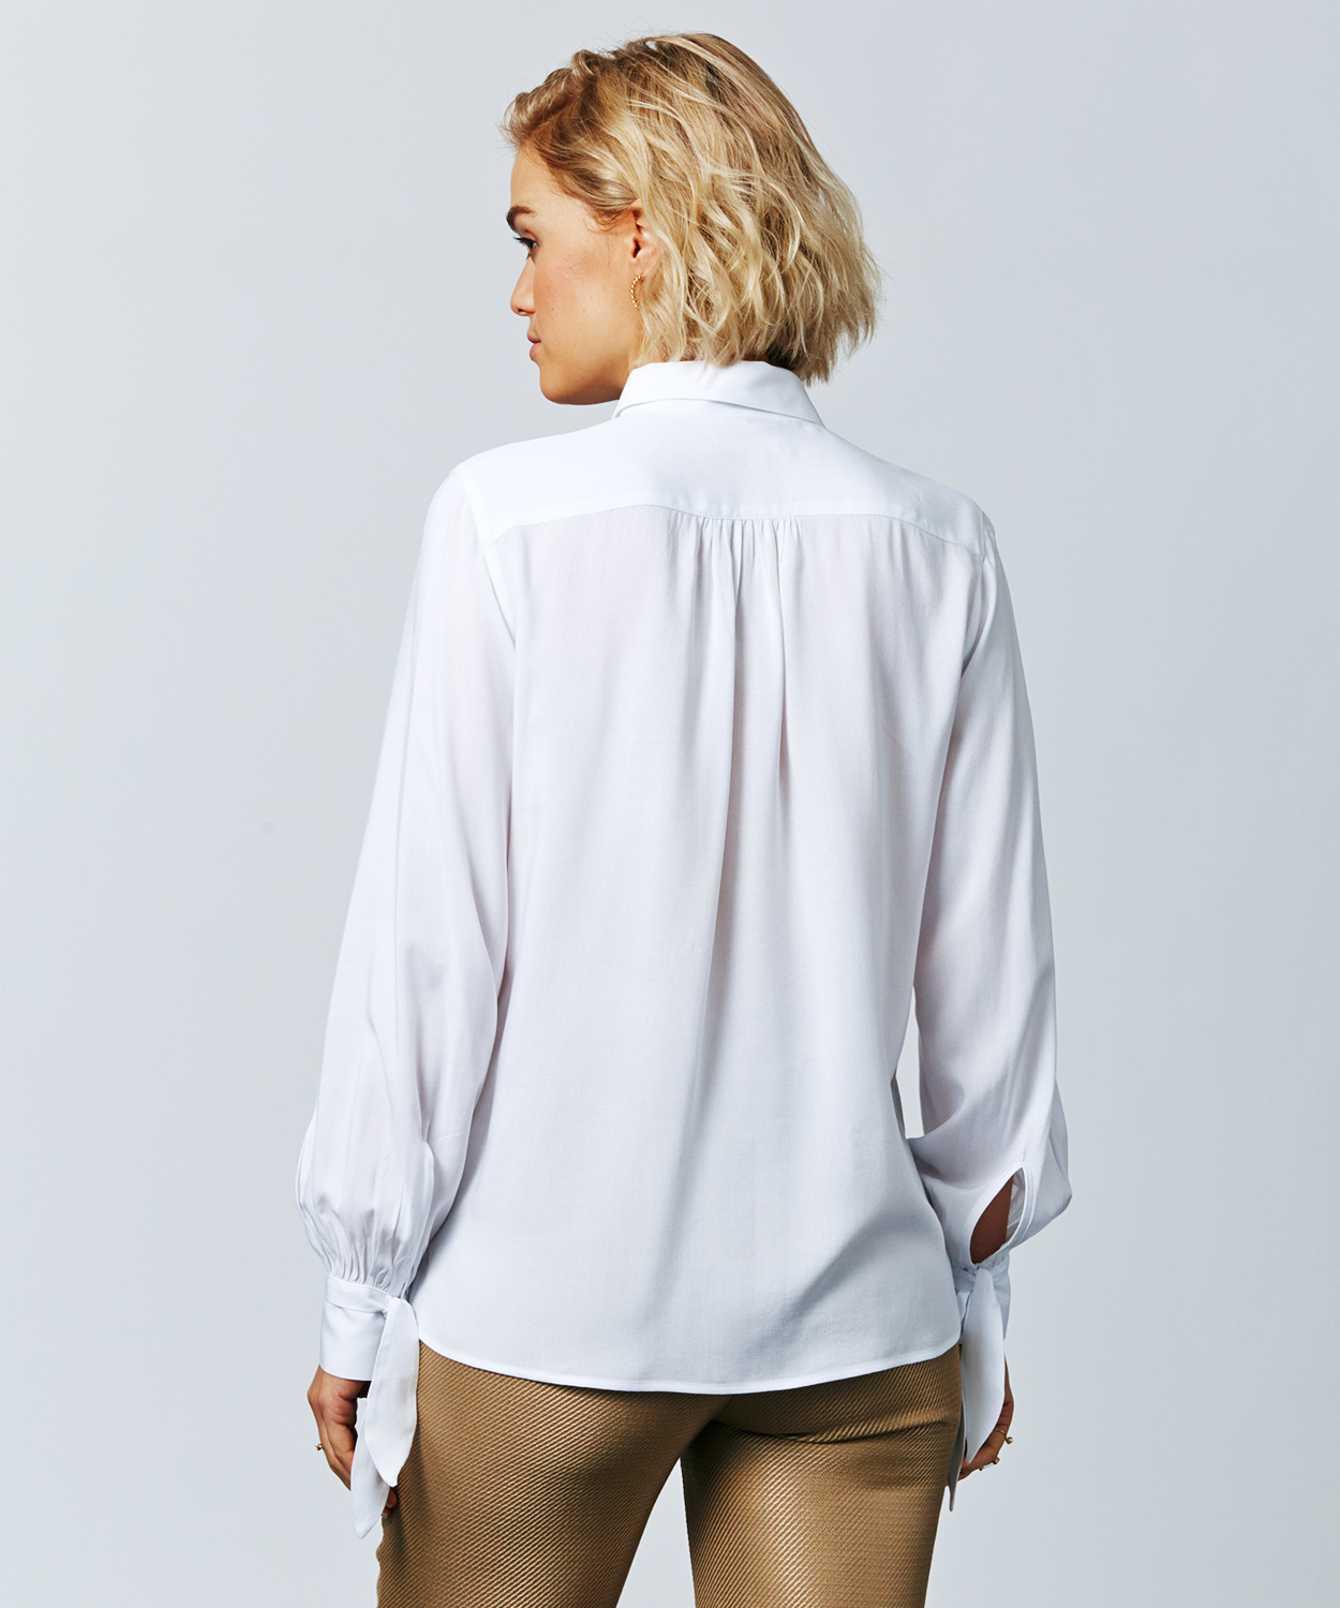 Skjorta Lina Sasha Vit The Shirt Factory